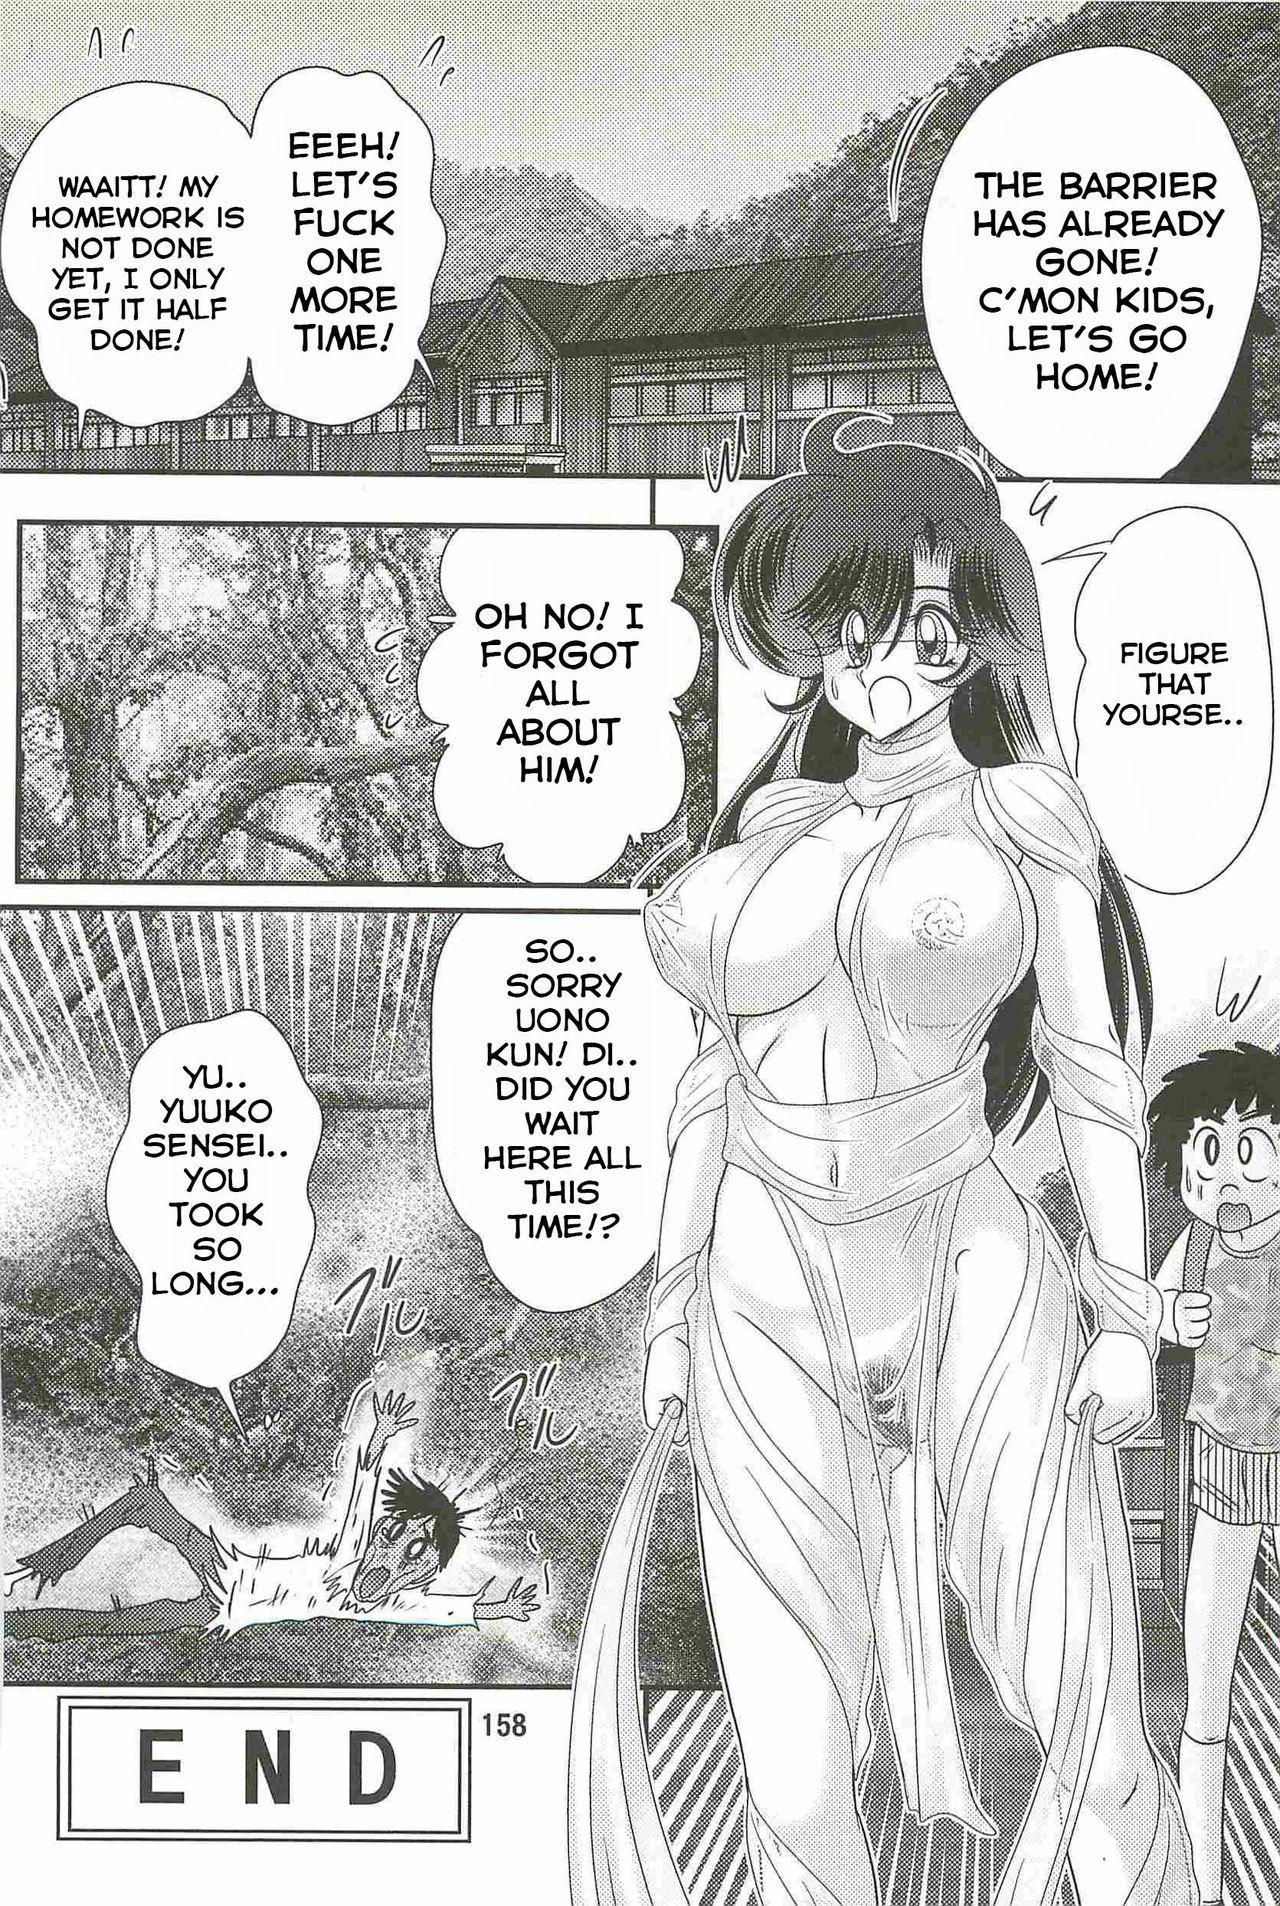 [Kamitou Masaki] Seirei Tokusou Fairy Saber W - Youen Tennyo Den Ch. 5-6 [English] [Hong_Mei_Ling] 31